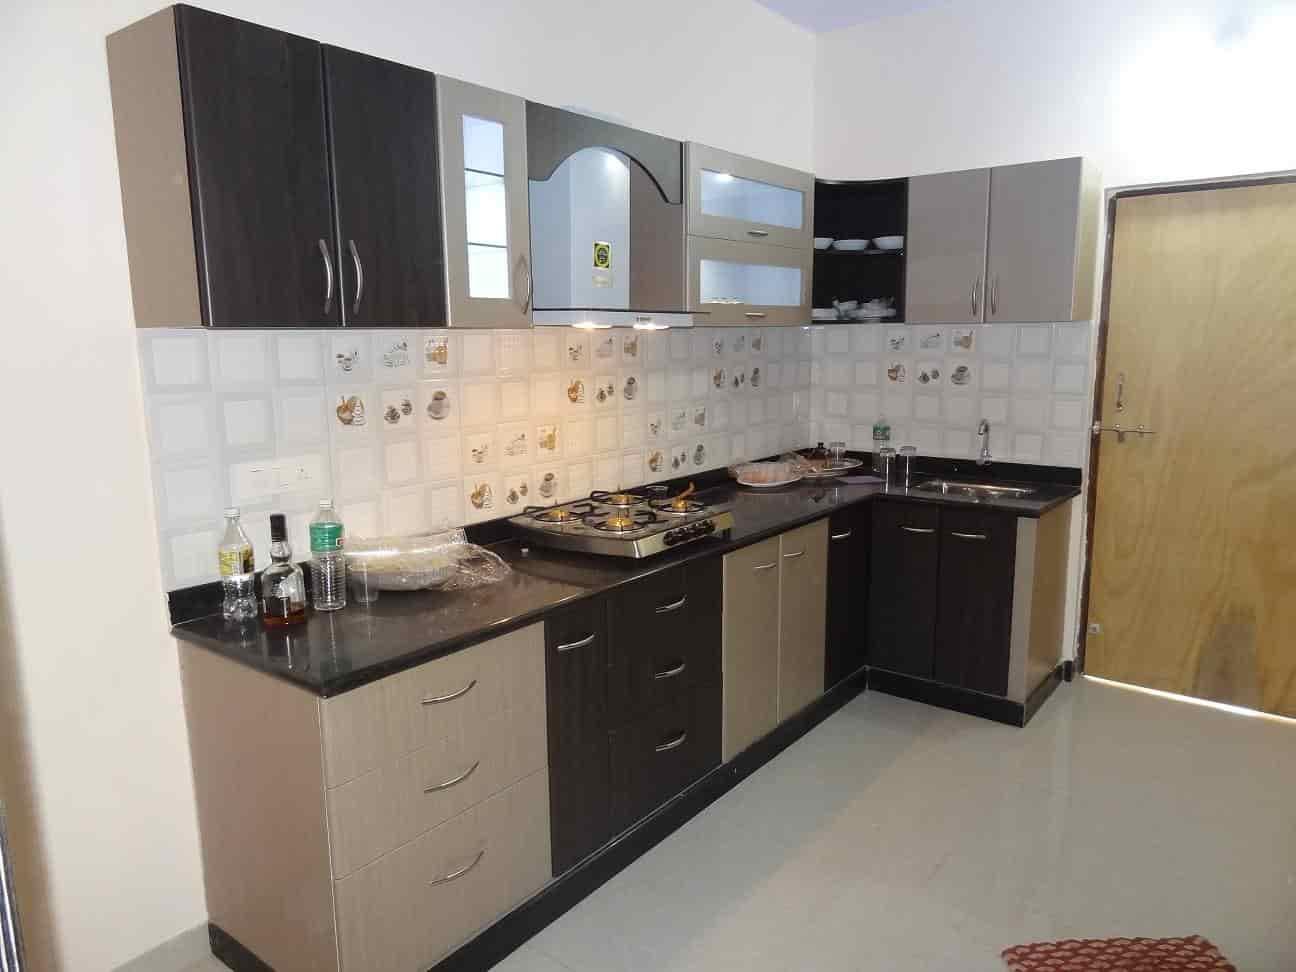 dks modular kitchens and accessories mapusa   dks modular kitchens  u0026 accessories   modular kitchen dealers in goa   justdial dks modular kitchens and accessories mapusa   dks modular      rh   justdial com